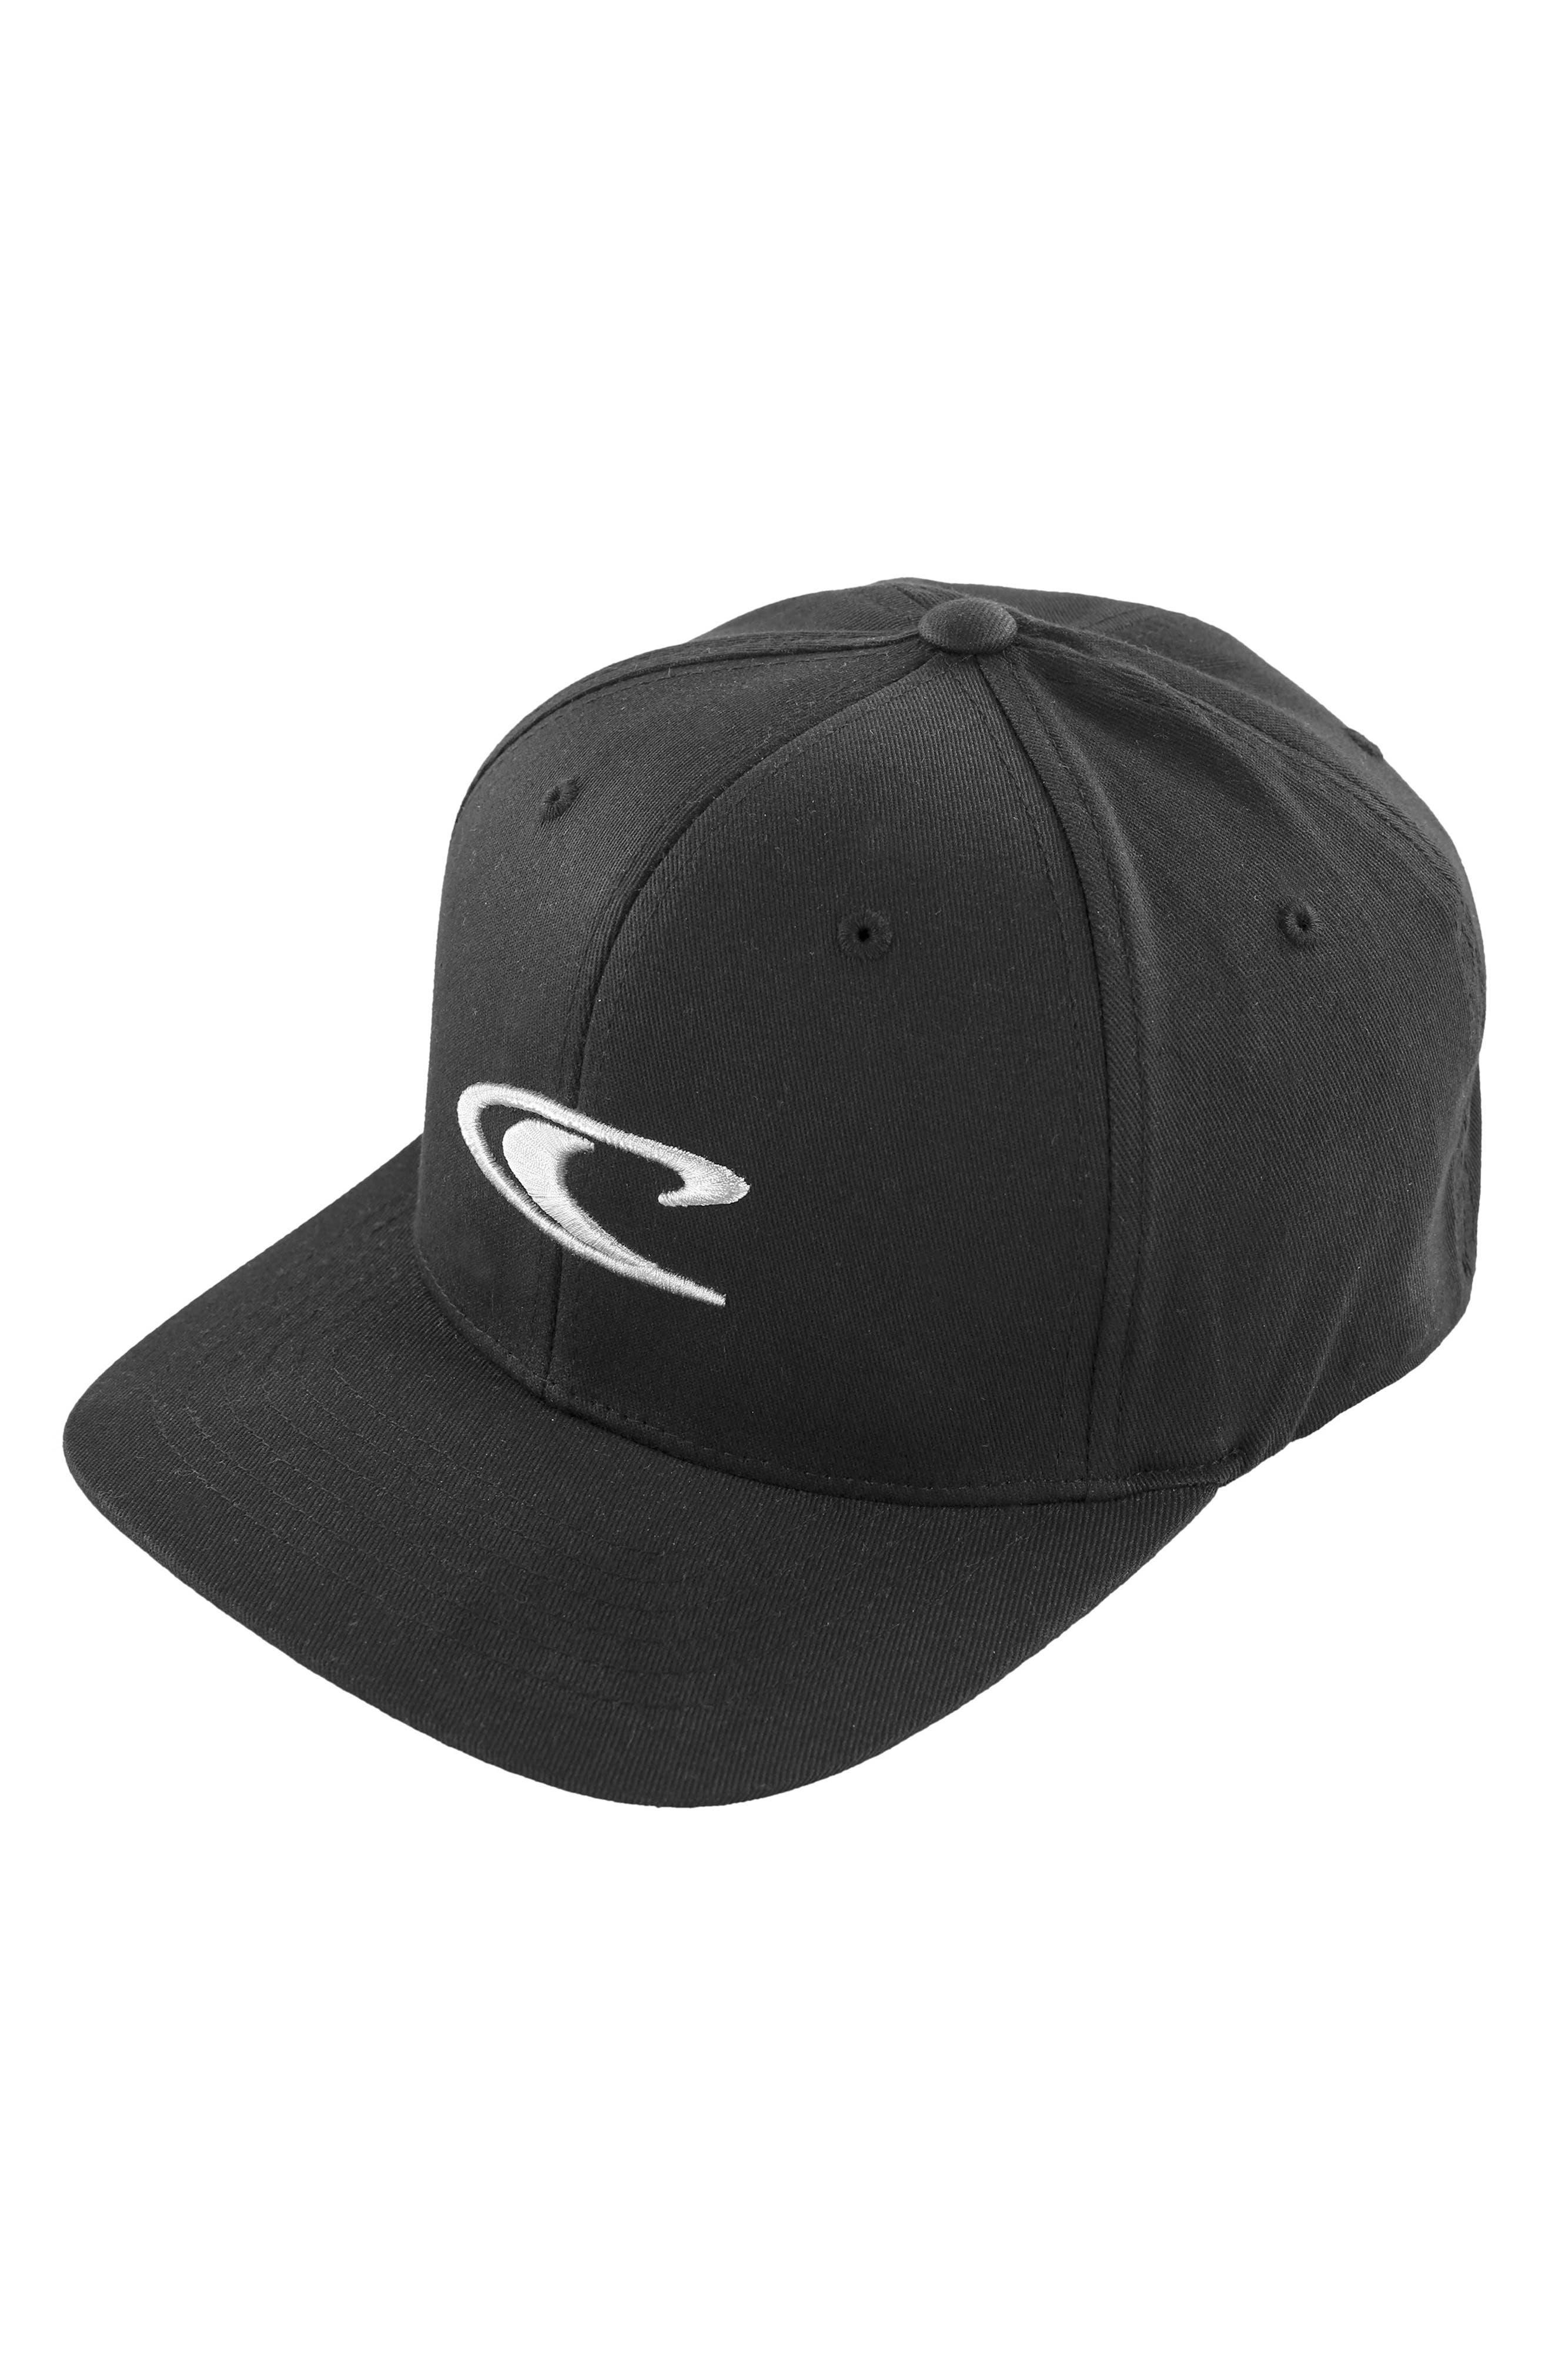 Clean & Mean Cap,                         Main,                         color, Black